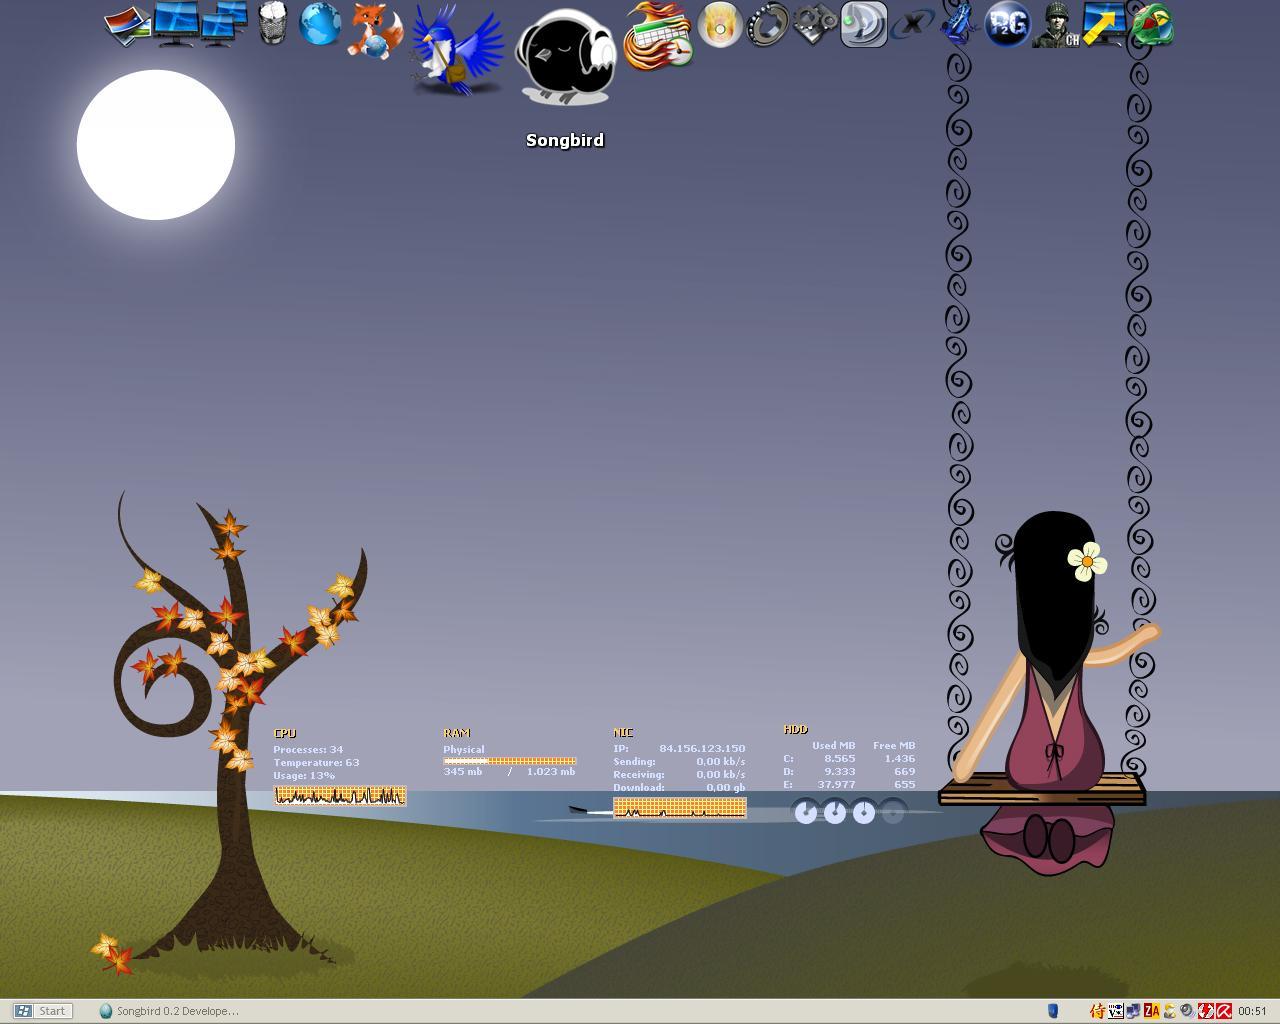 Title: Sauberer Desktop ^^